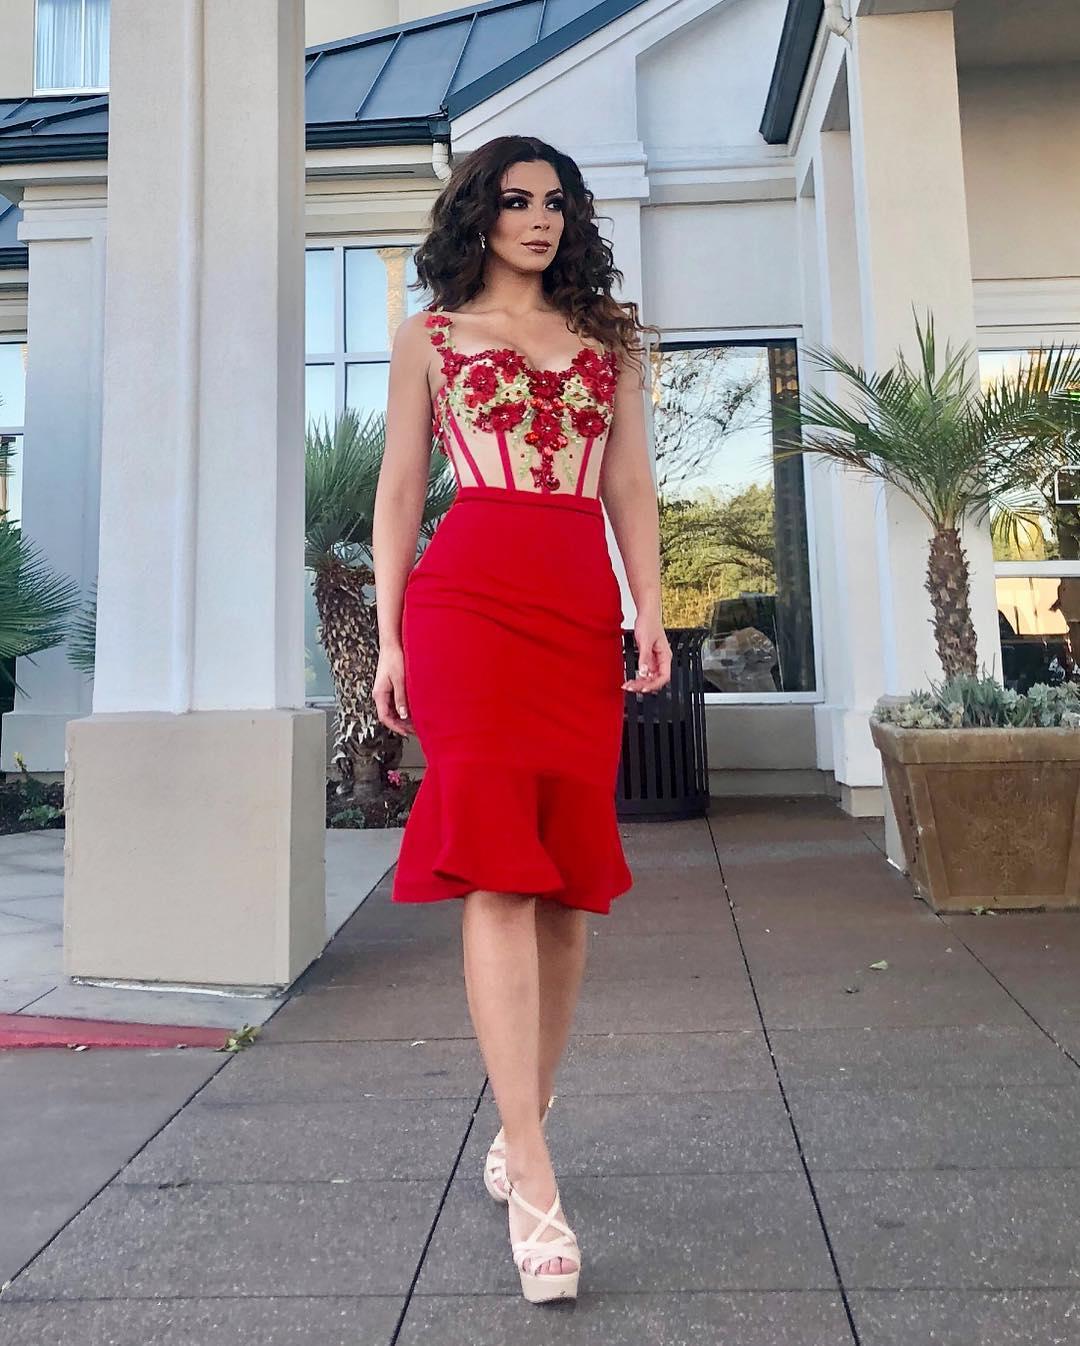 itzel paola astudillo, miss chiapas 2020 para miss mexico 2021/primera finalista de miss panamerican international 2018/top 16 de miss earth 2016. - Página 6 43984710